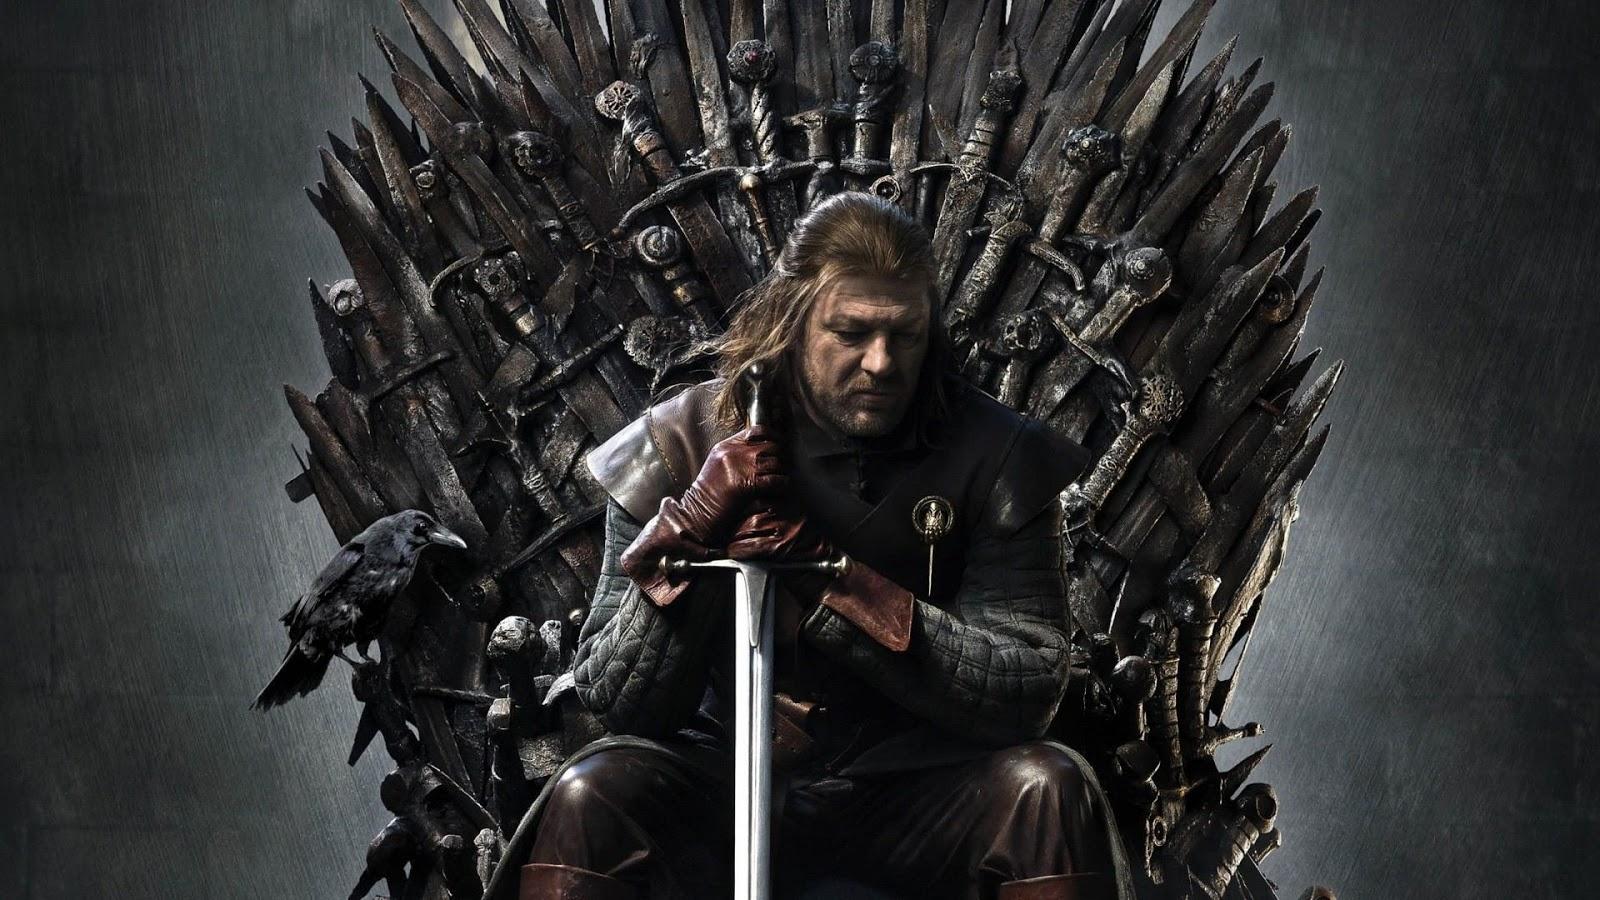 juego de tronos temporada 2 gran torrent